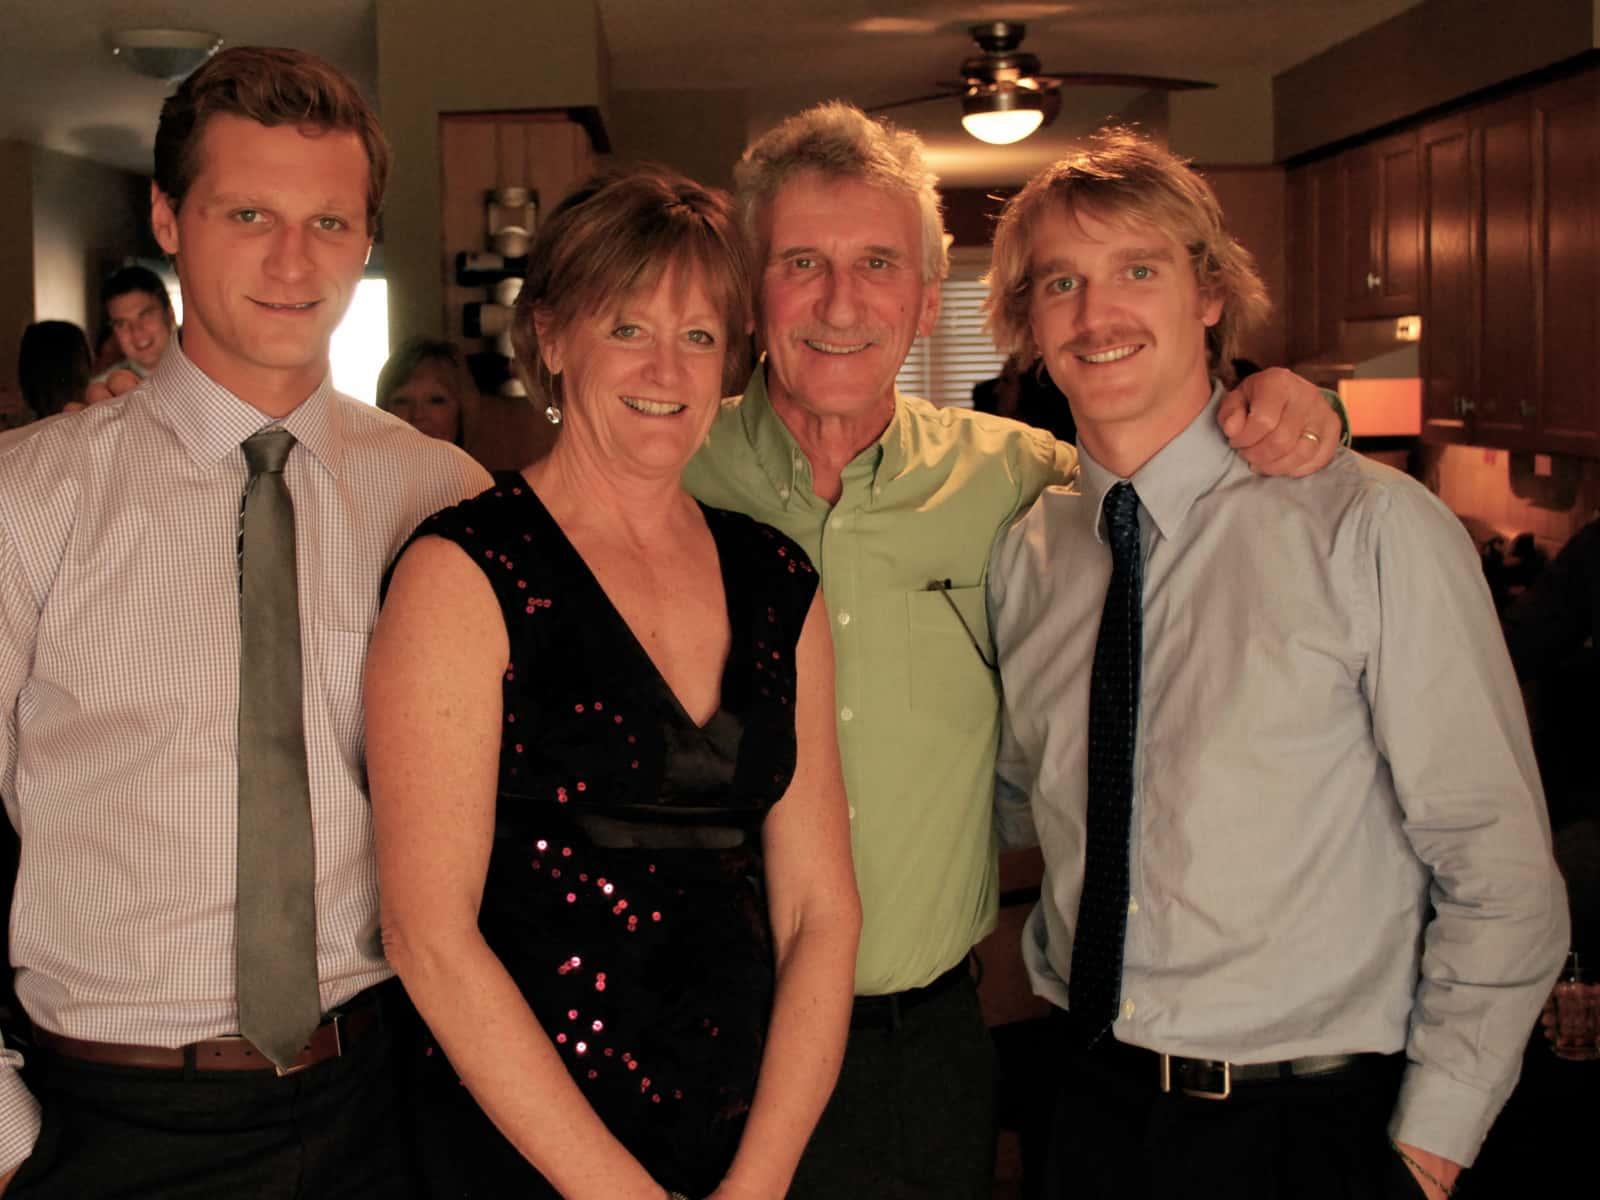 Jim & Fran from Collingwood, Ontario, Canada